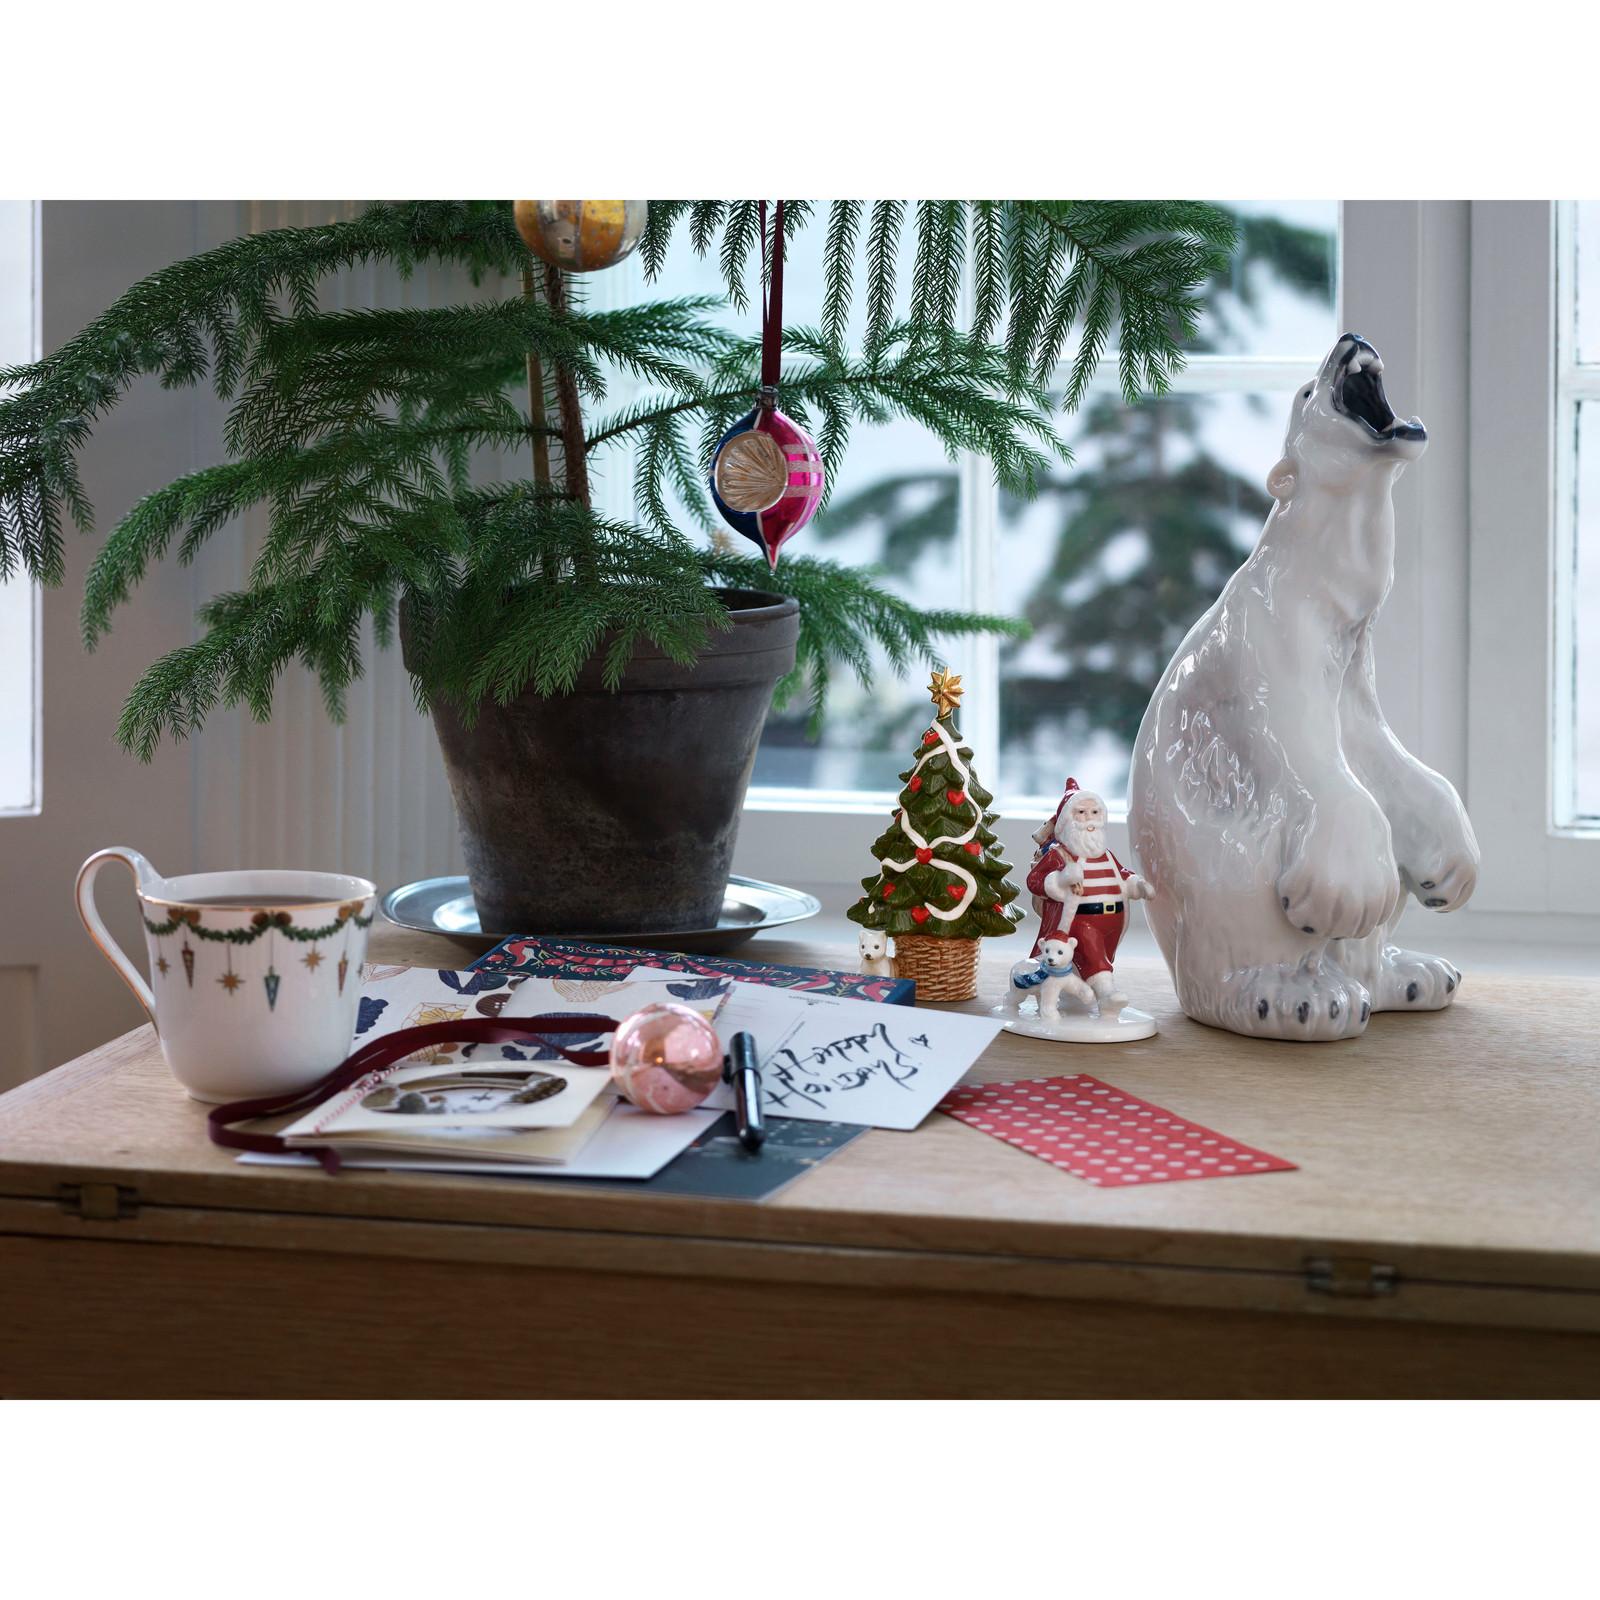 Royal Copenhagen 2020 Annual Christmas Tree Figurine & Santa